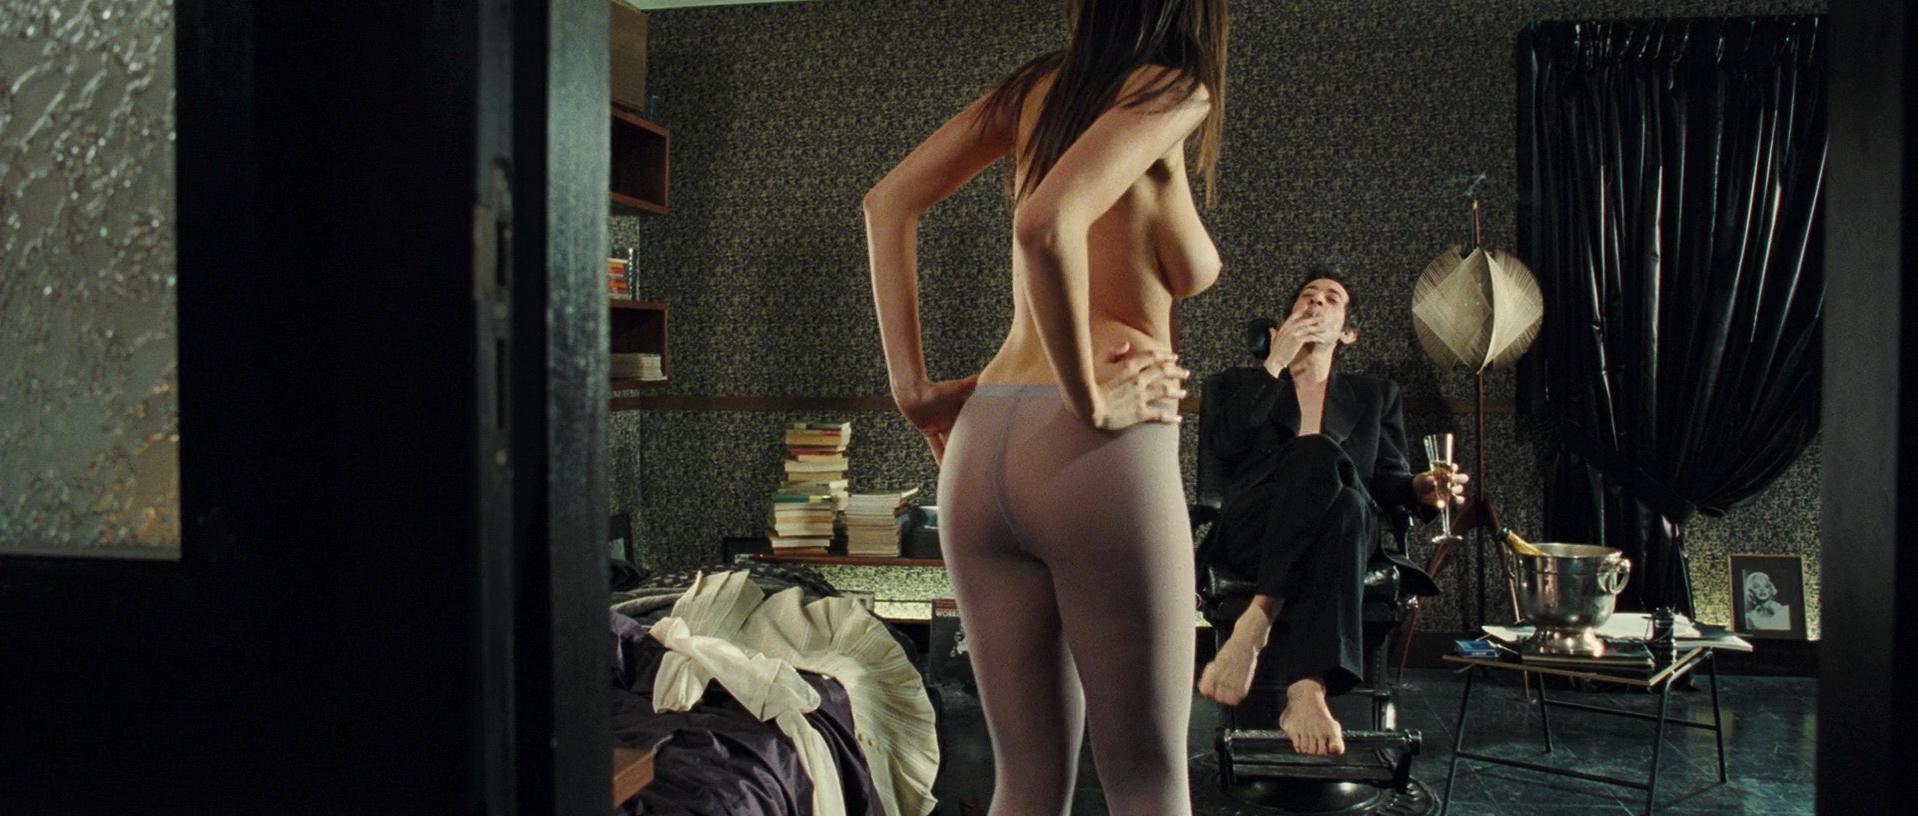 Deborah Grall nude - Gainsbourg (2010)